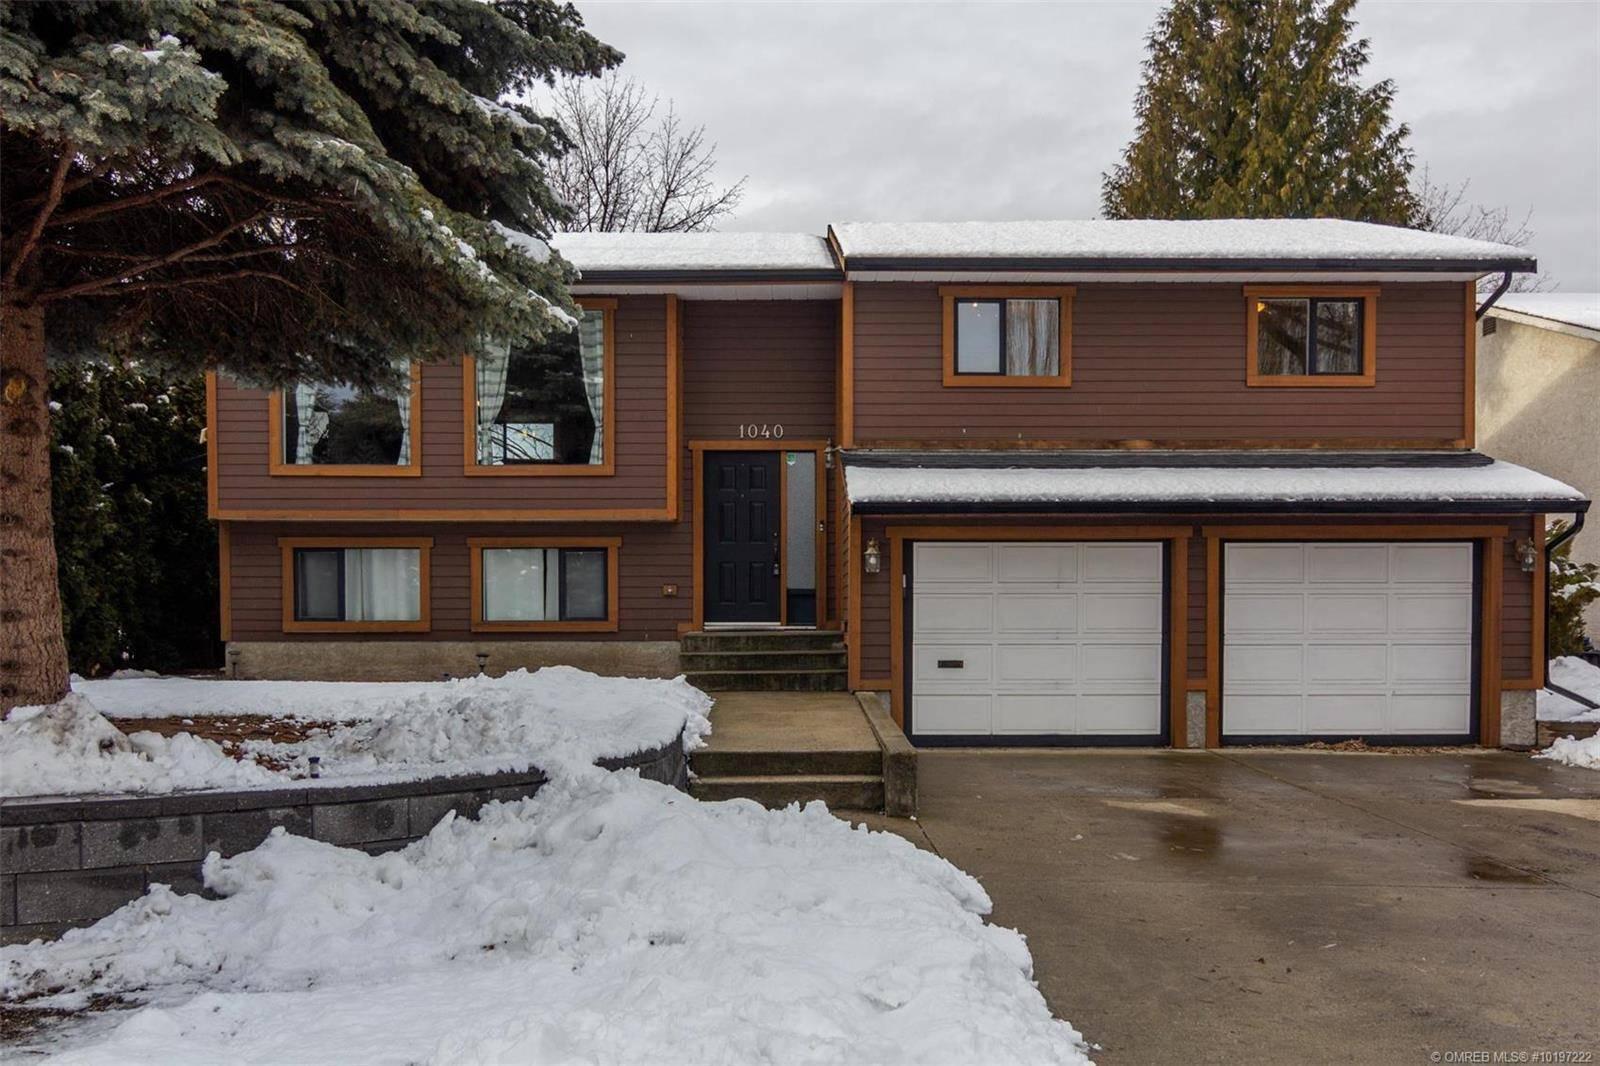 House for sale at 1040 Aldon Rd Kelowna British Columbia - MLS: 10197222